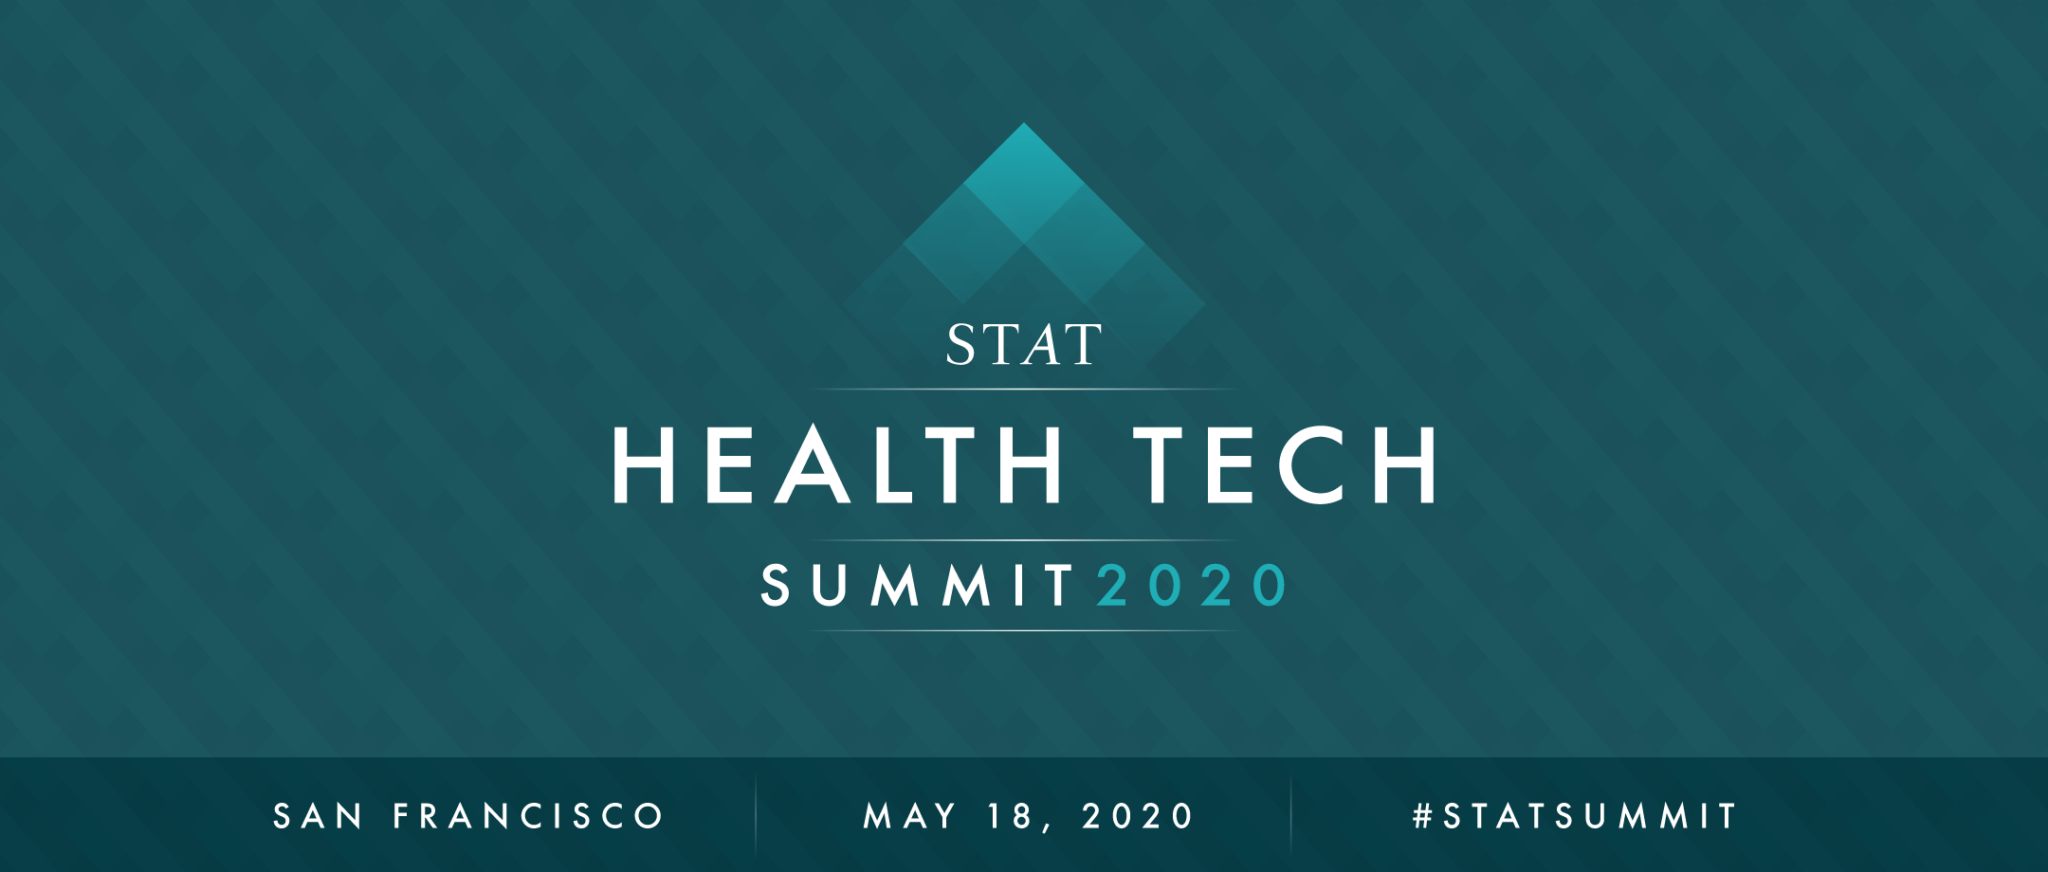 STAT Health Tech Summit 2020